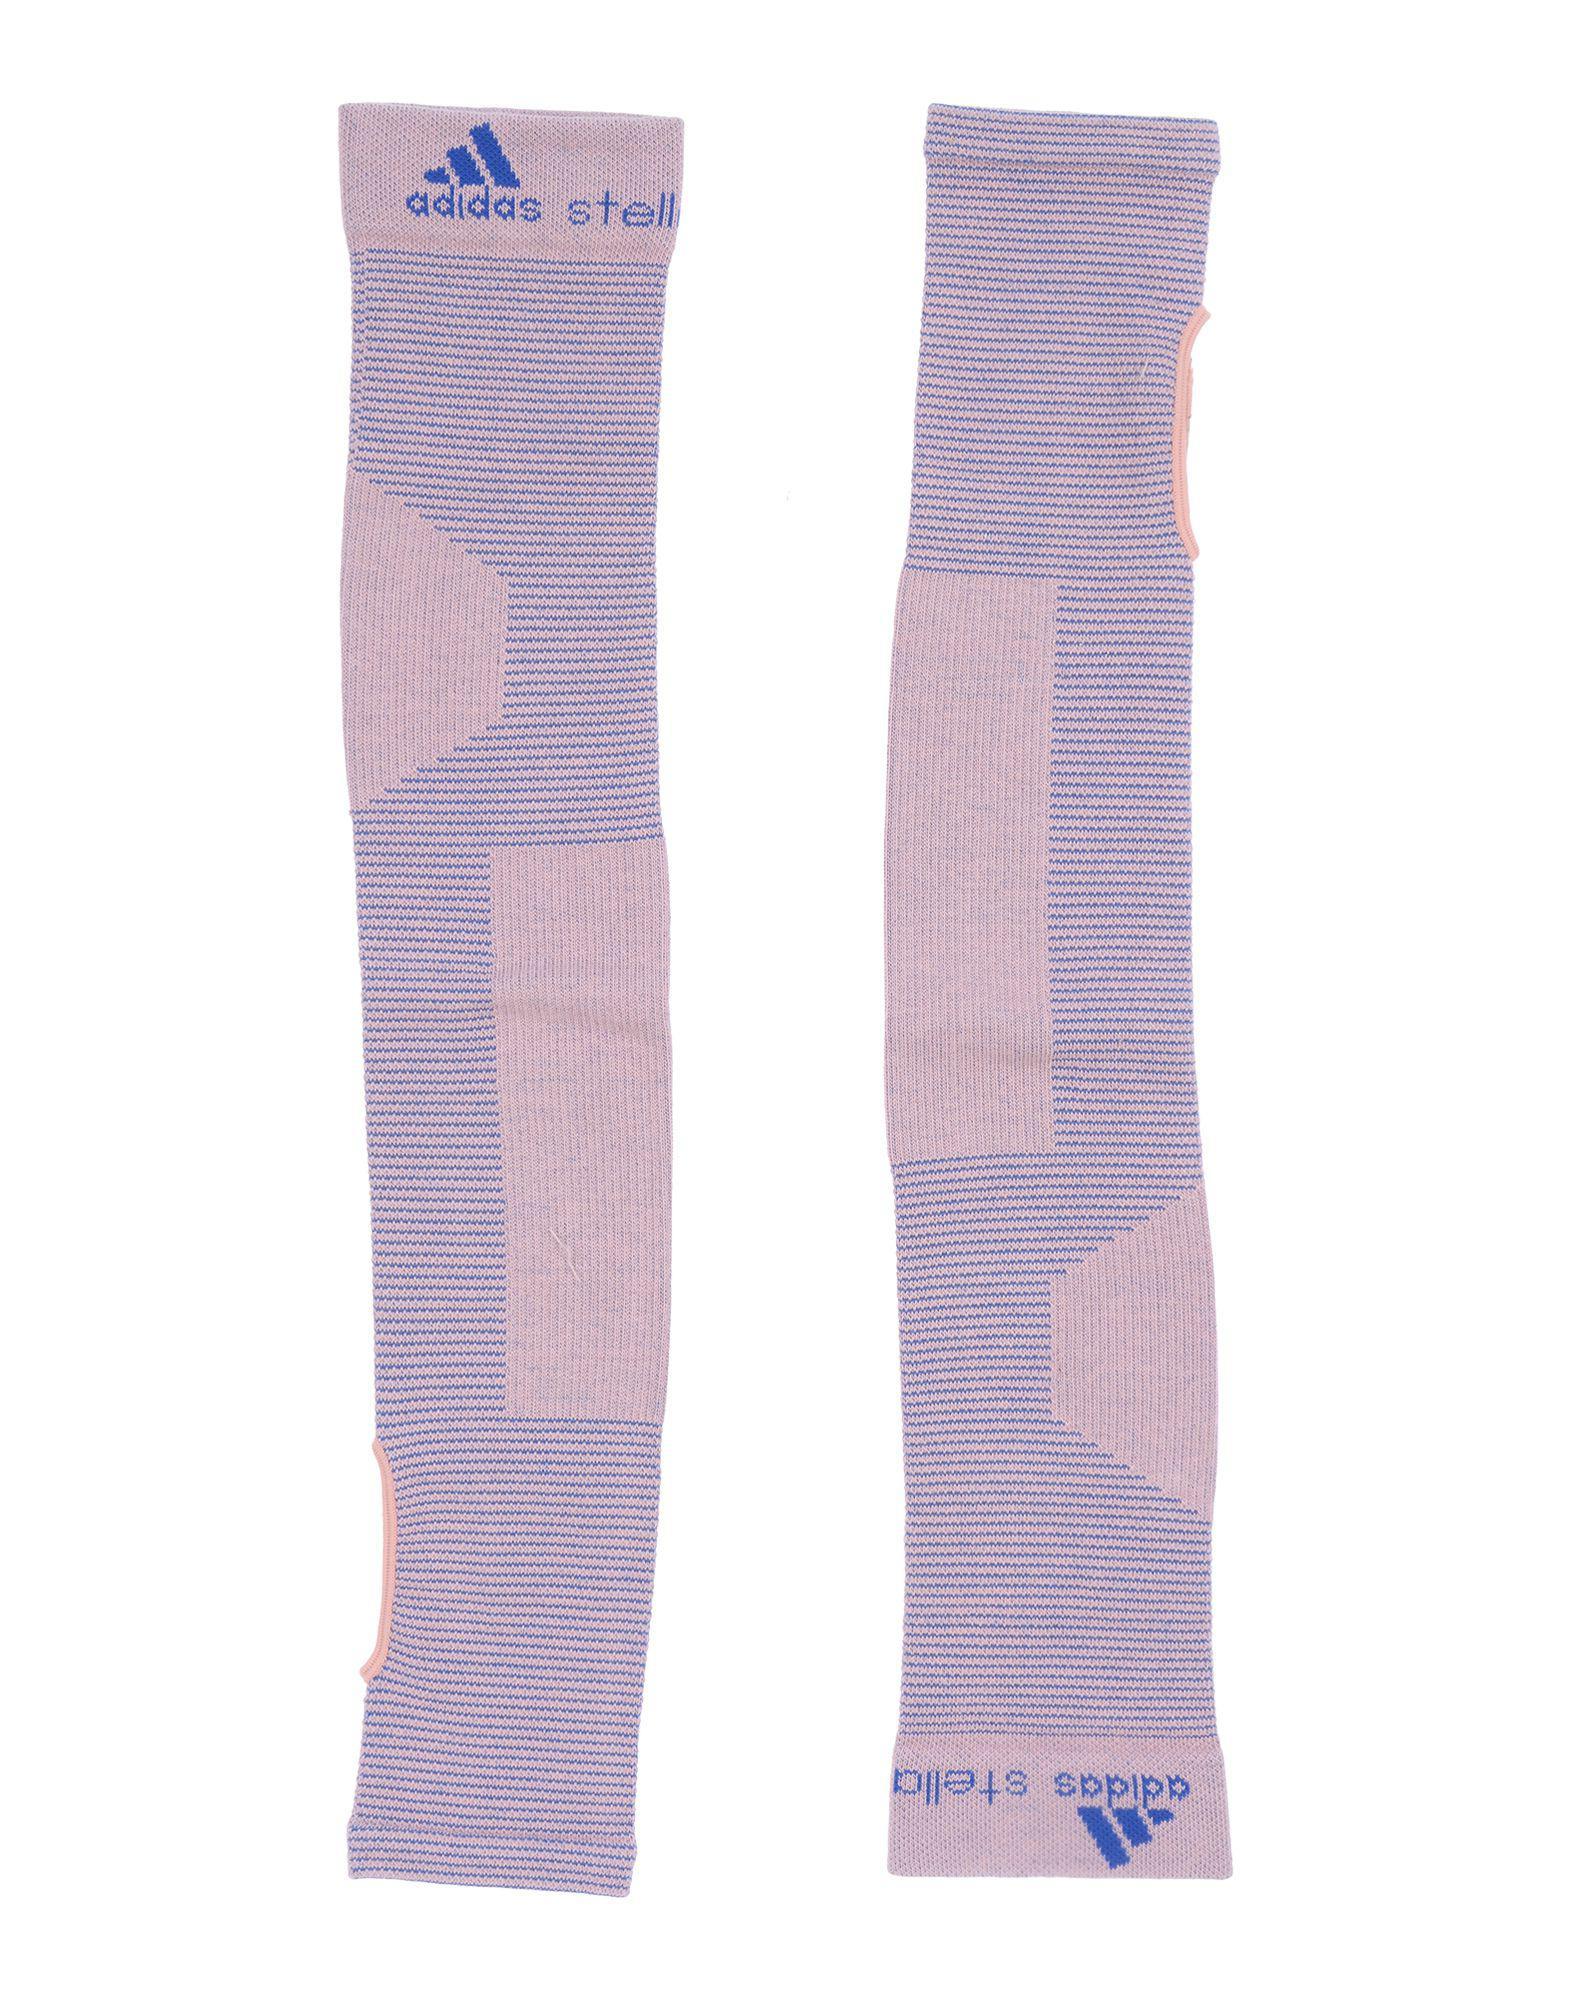 Lyst - Botas altas adidas By Stella McCartney de color Rosa 08a330ba4e3